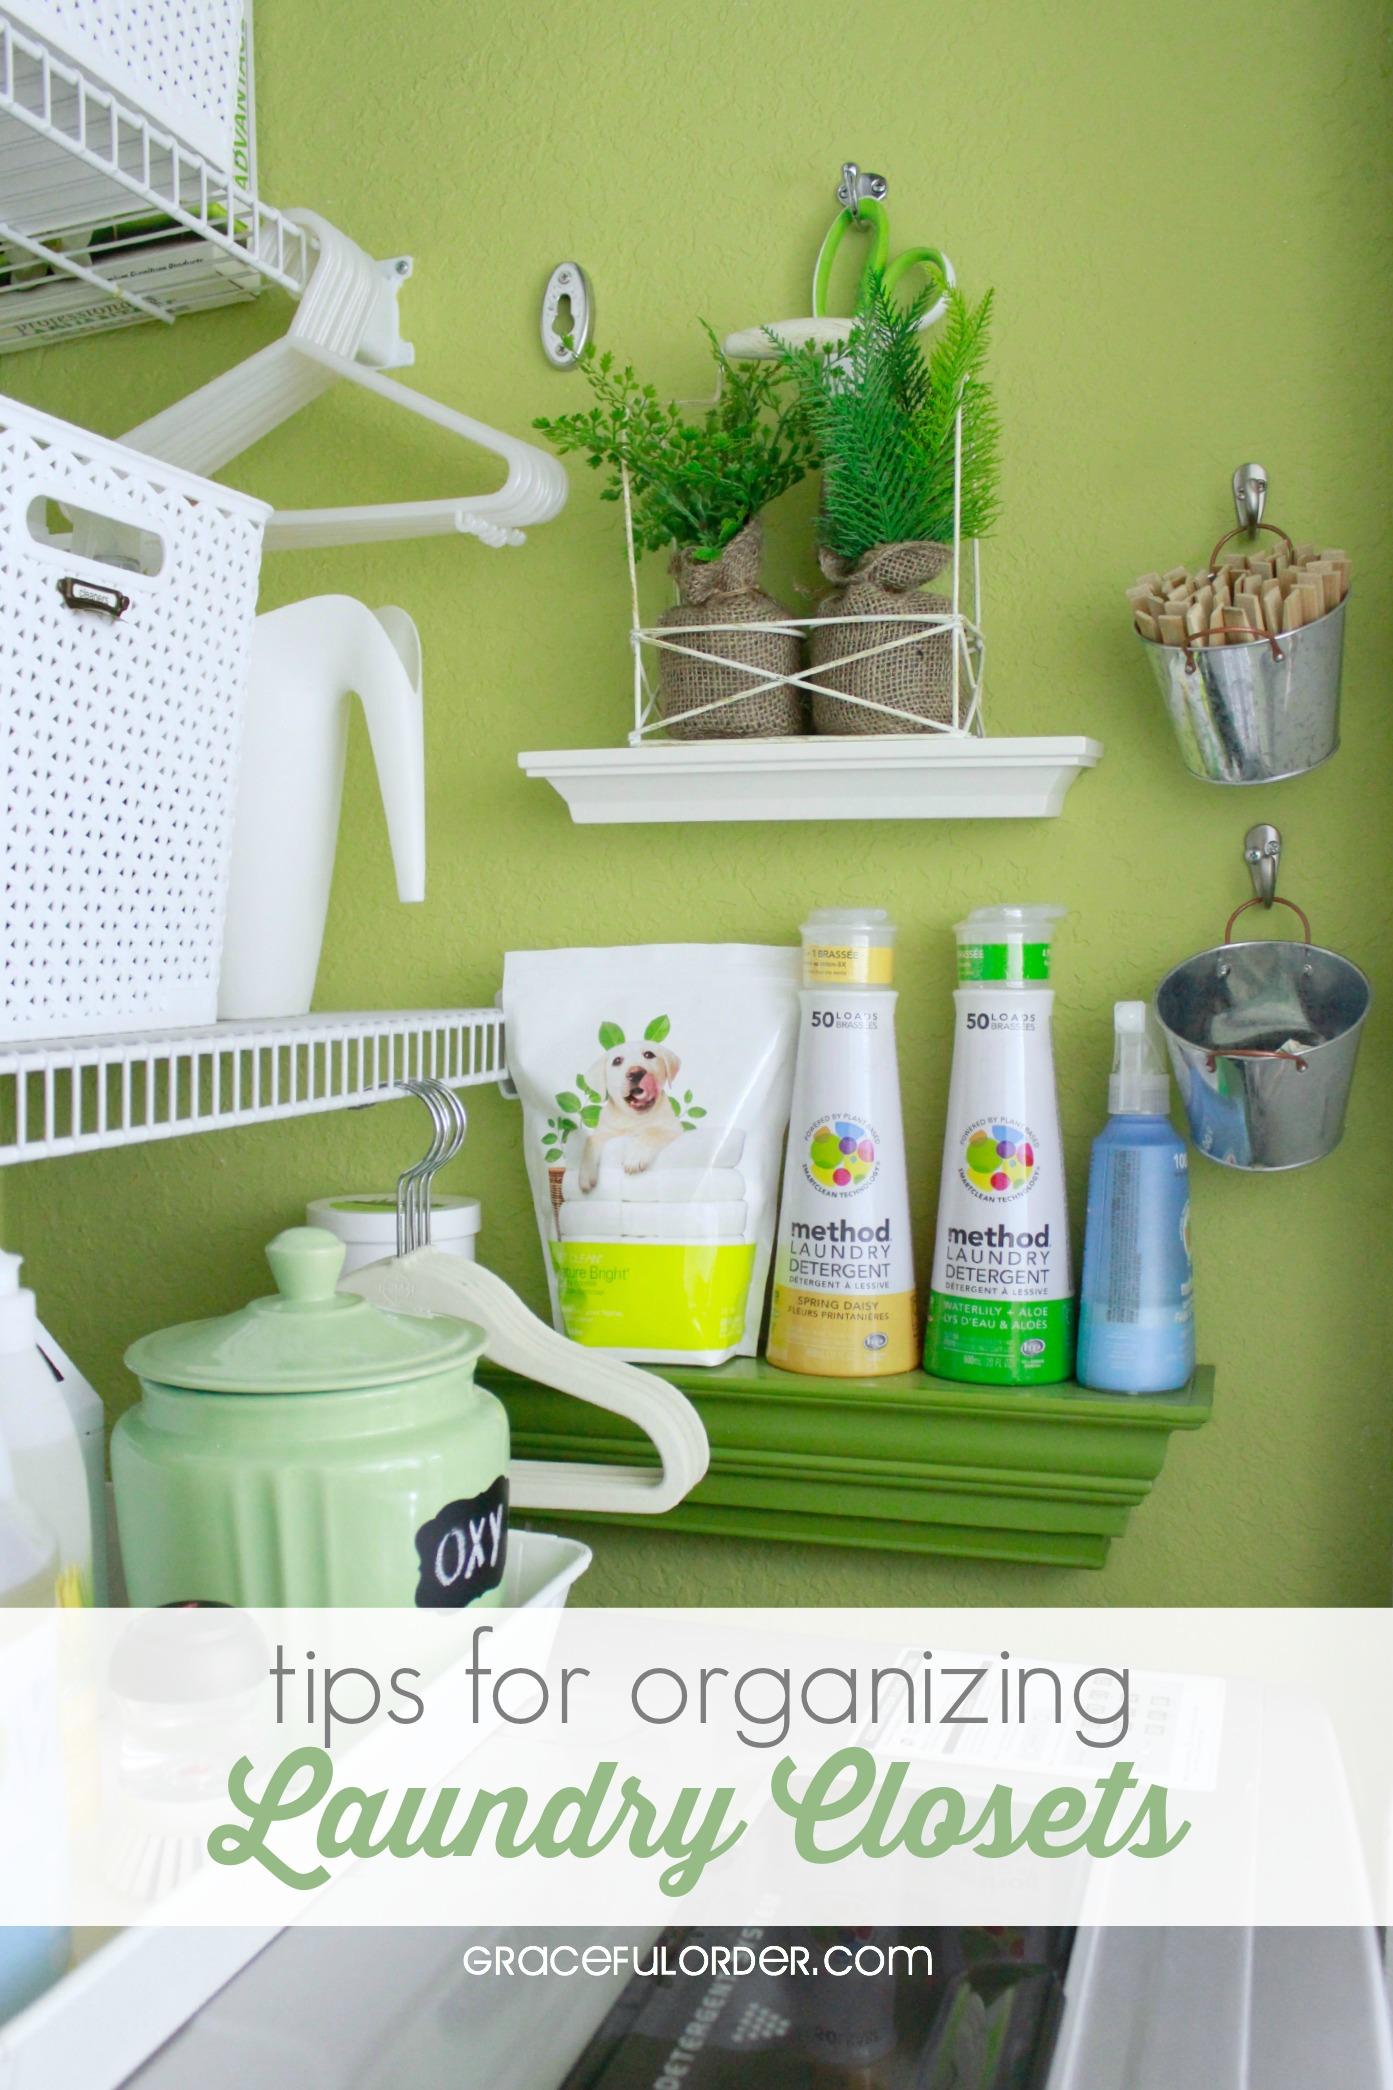 Laundry Closet Organization Ideas Part - 30: Tips For Organizing Laundry Closets